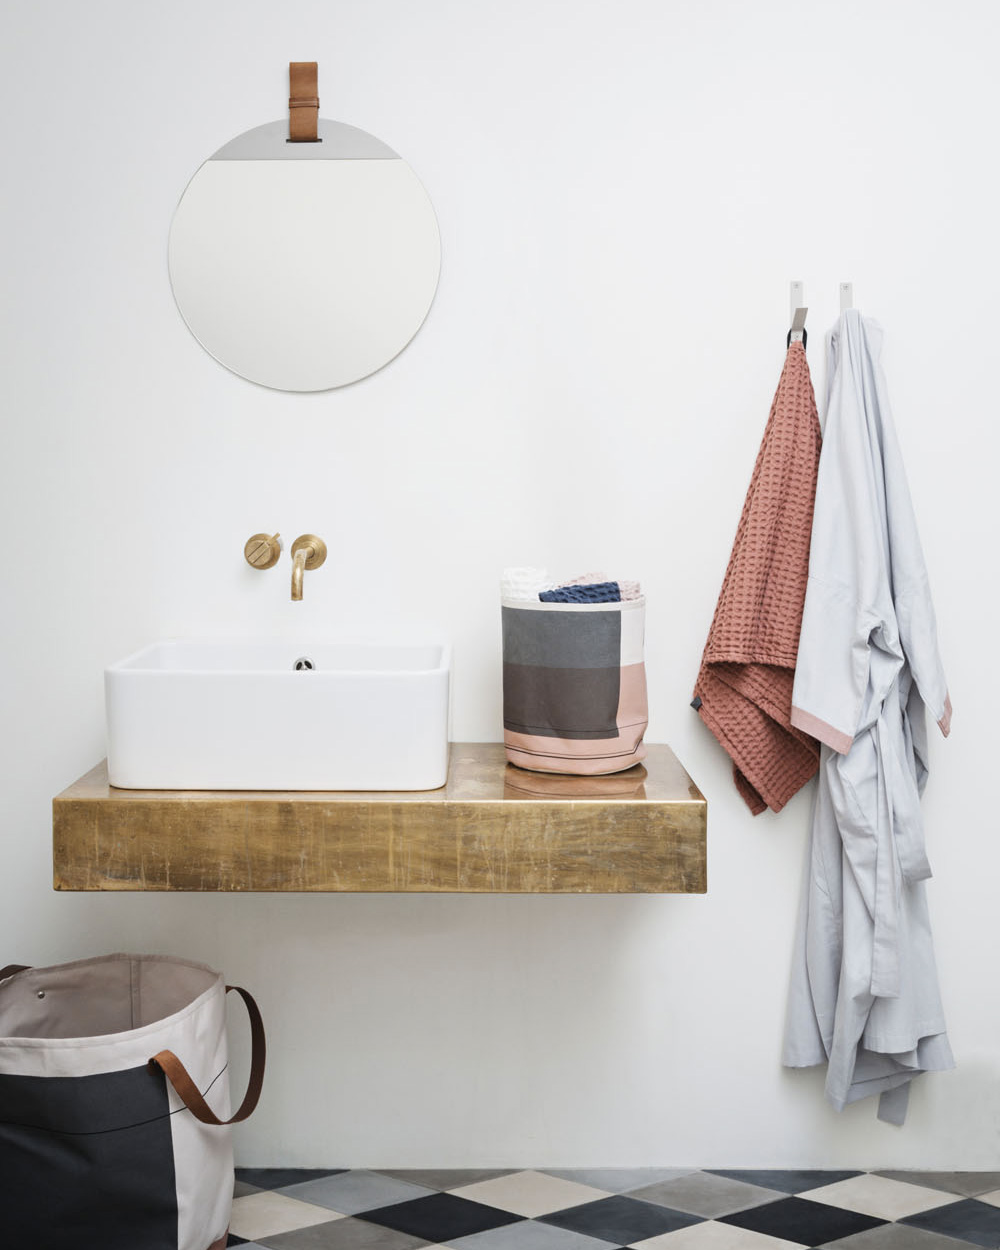 vasque suspendue sur bois